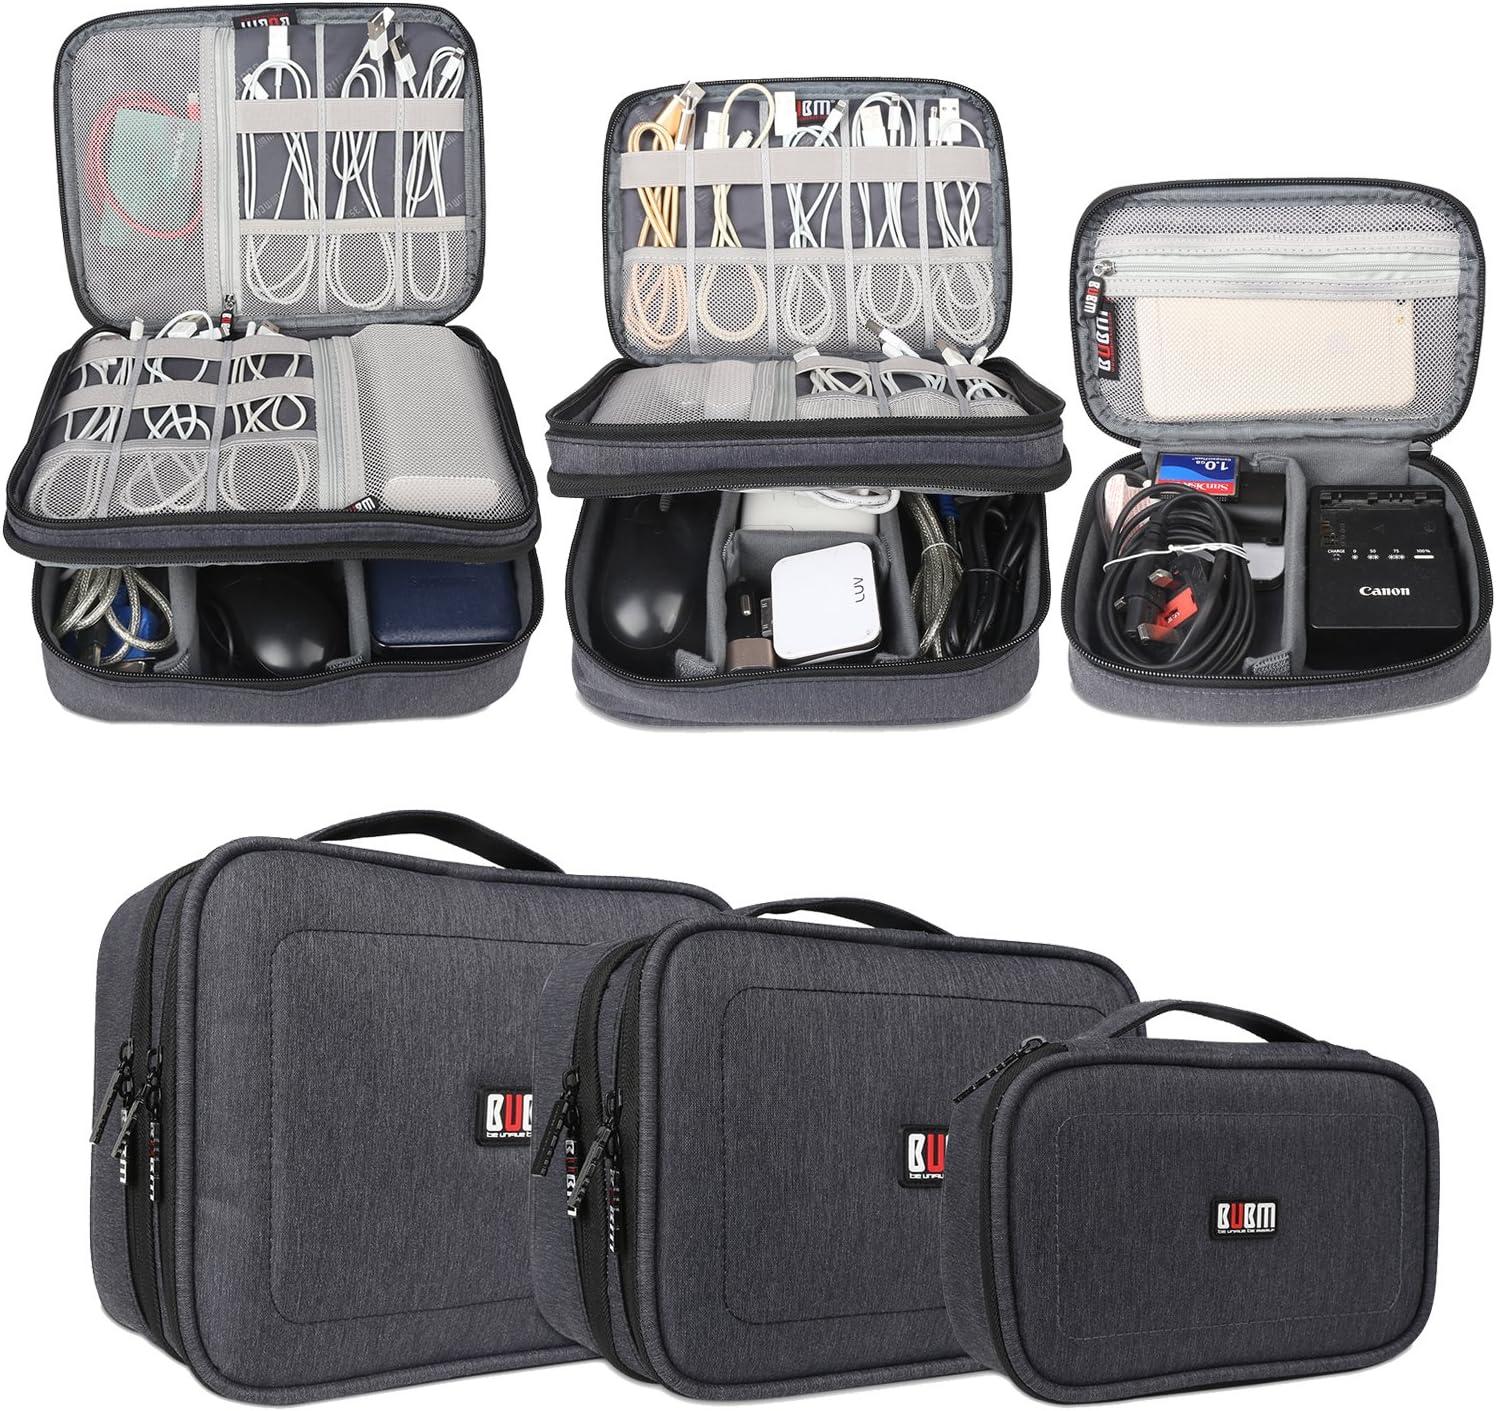 BUBM Estuches para Cables Bolsa para Aparato Electronico 3 Piezas para Guardar Memorias de USB Bolso de Ordenados Baterias Gadgets Mochilas de Cargador iPad/iPad Mini, Azul Oscuro